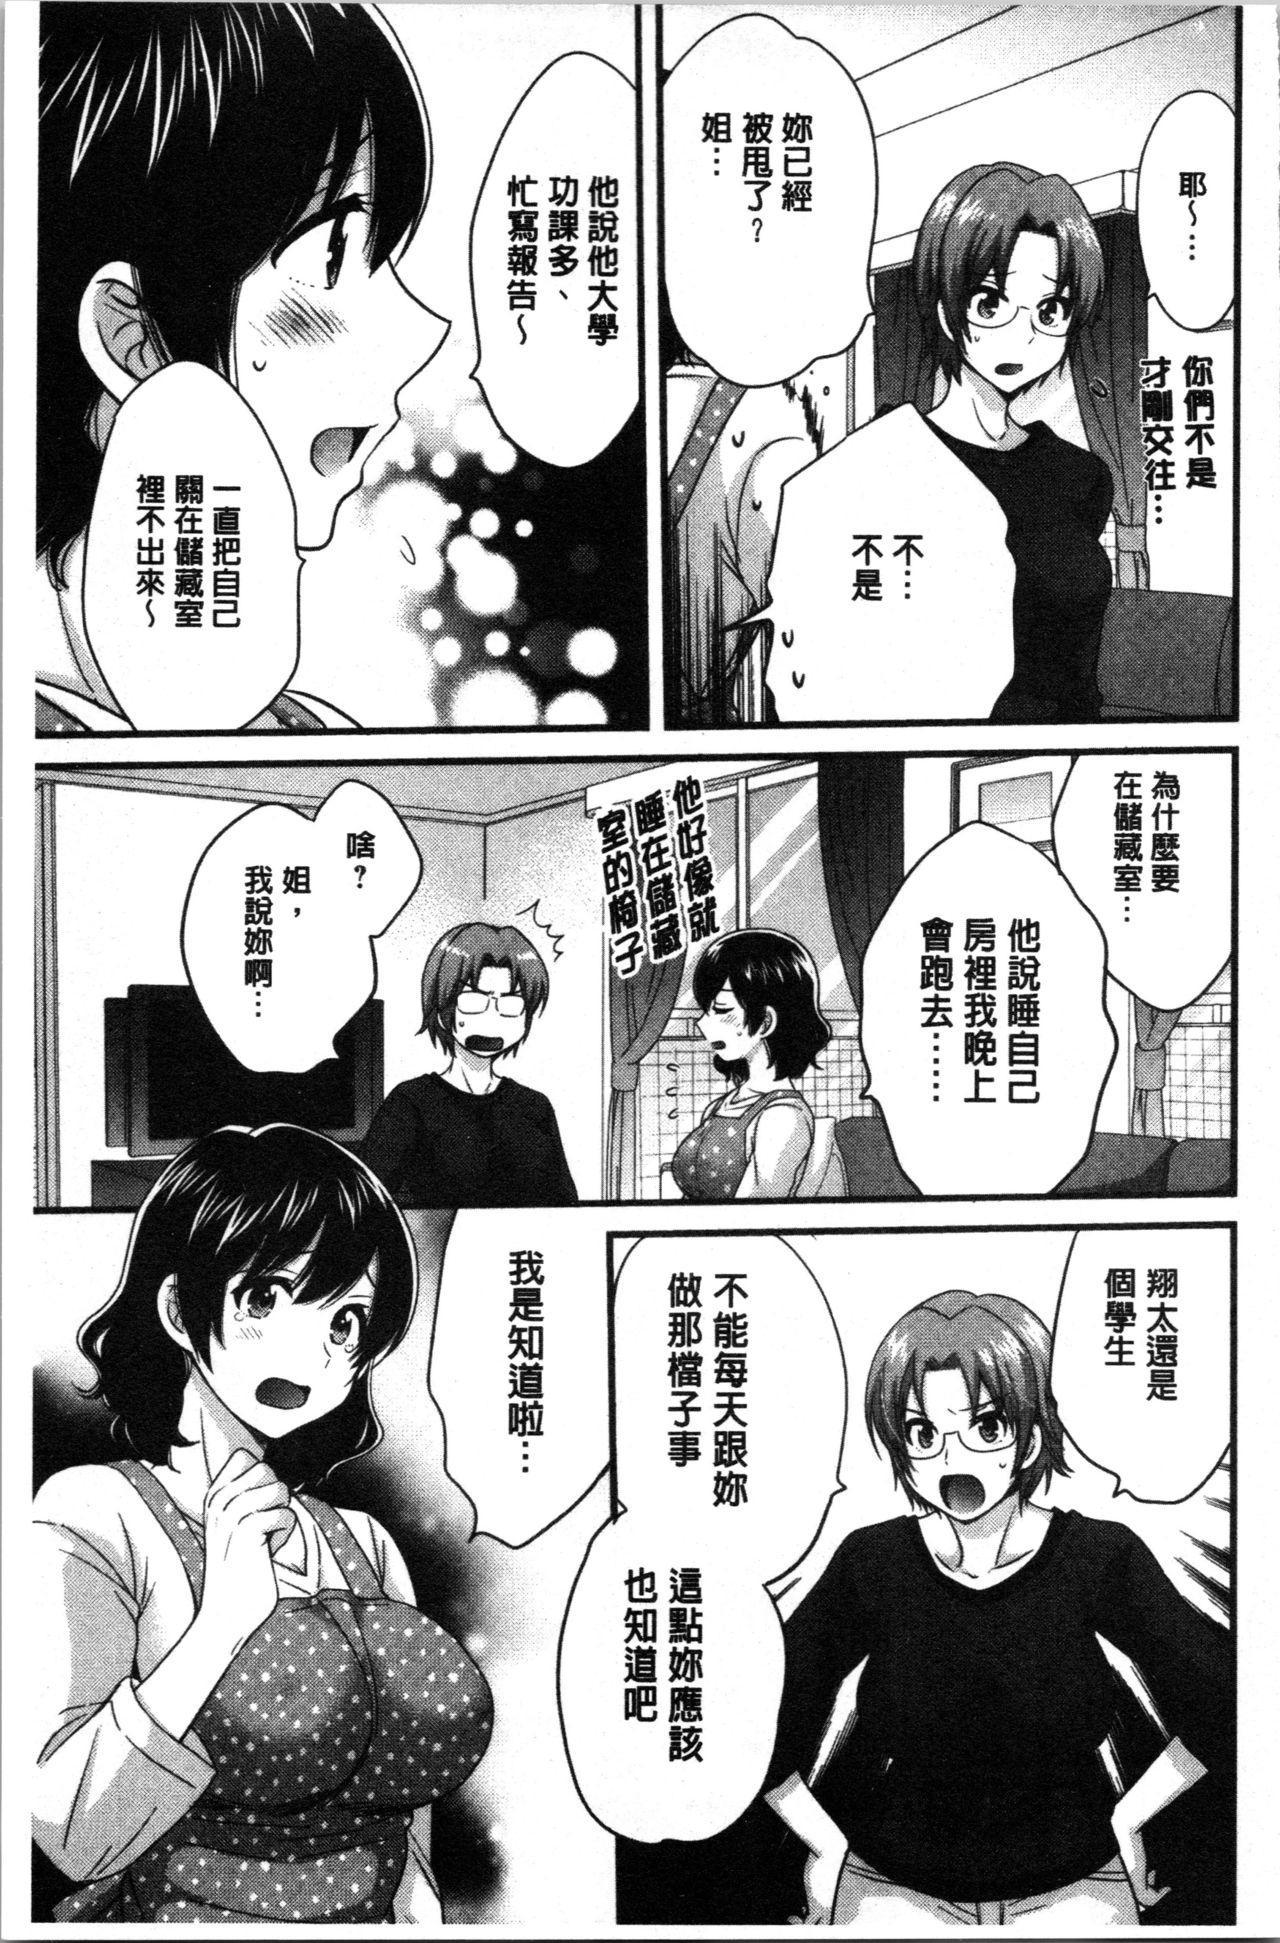 Ottori Midarana Mikami-san   嫻淑優雅又淫亂的三上小姐 158